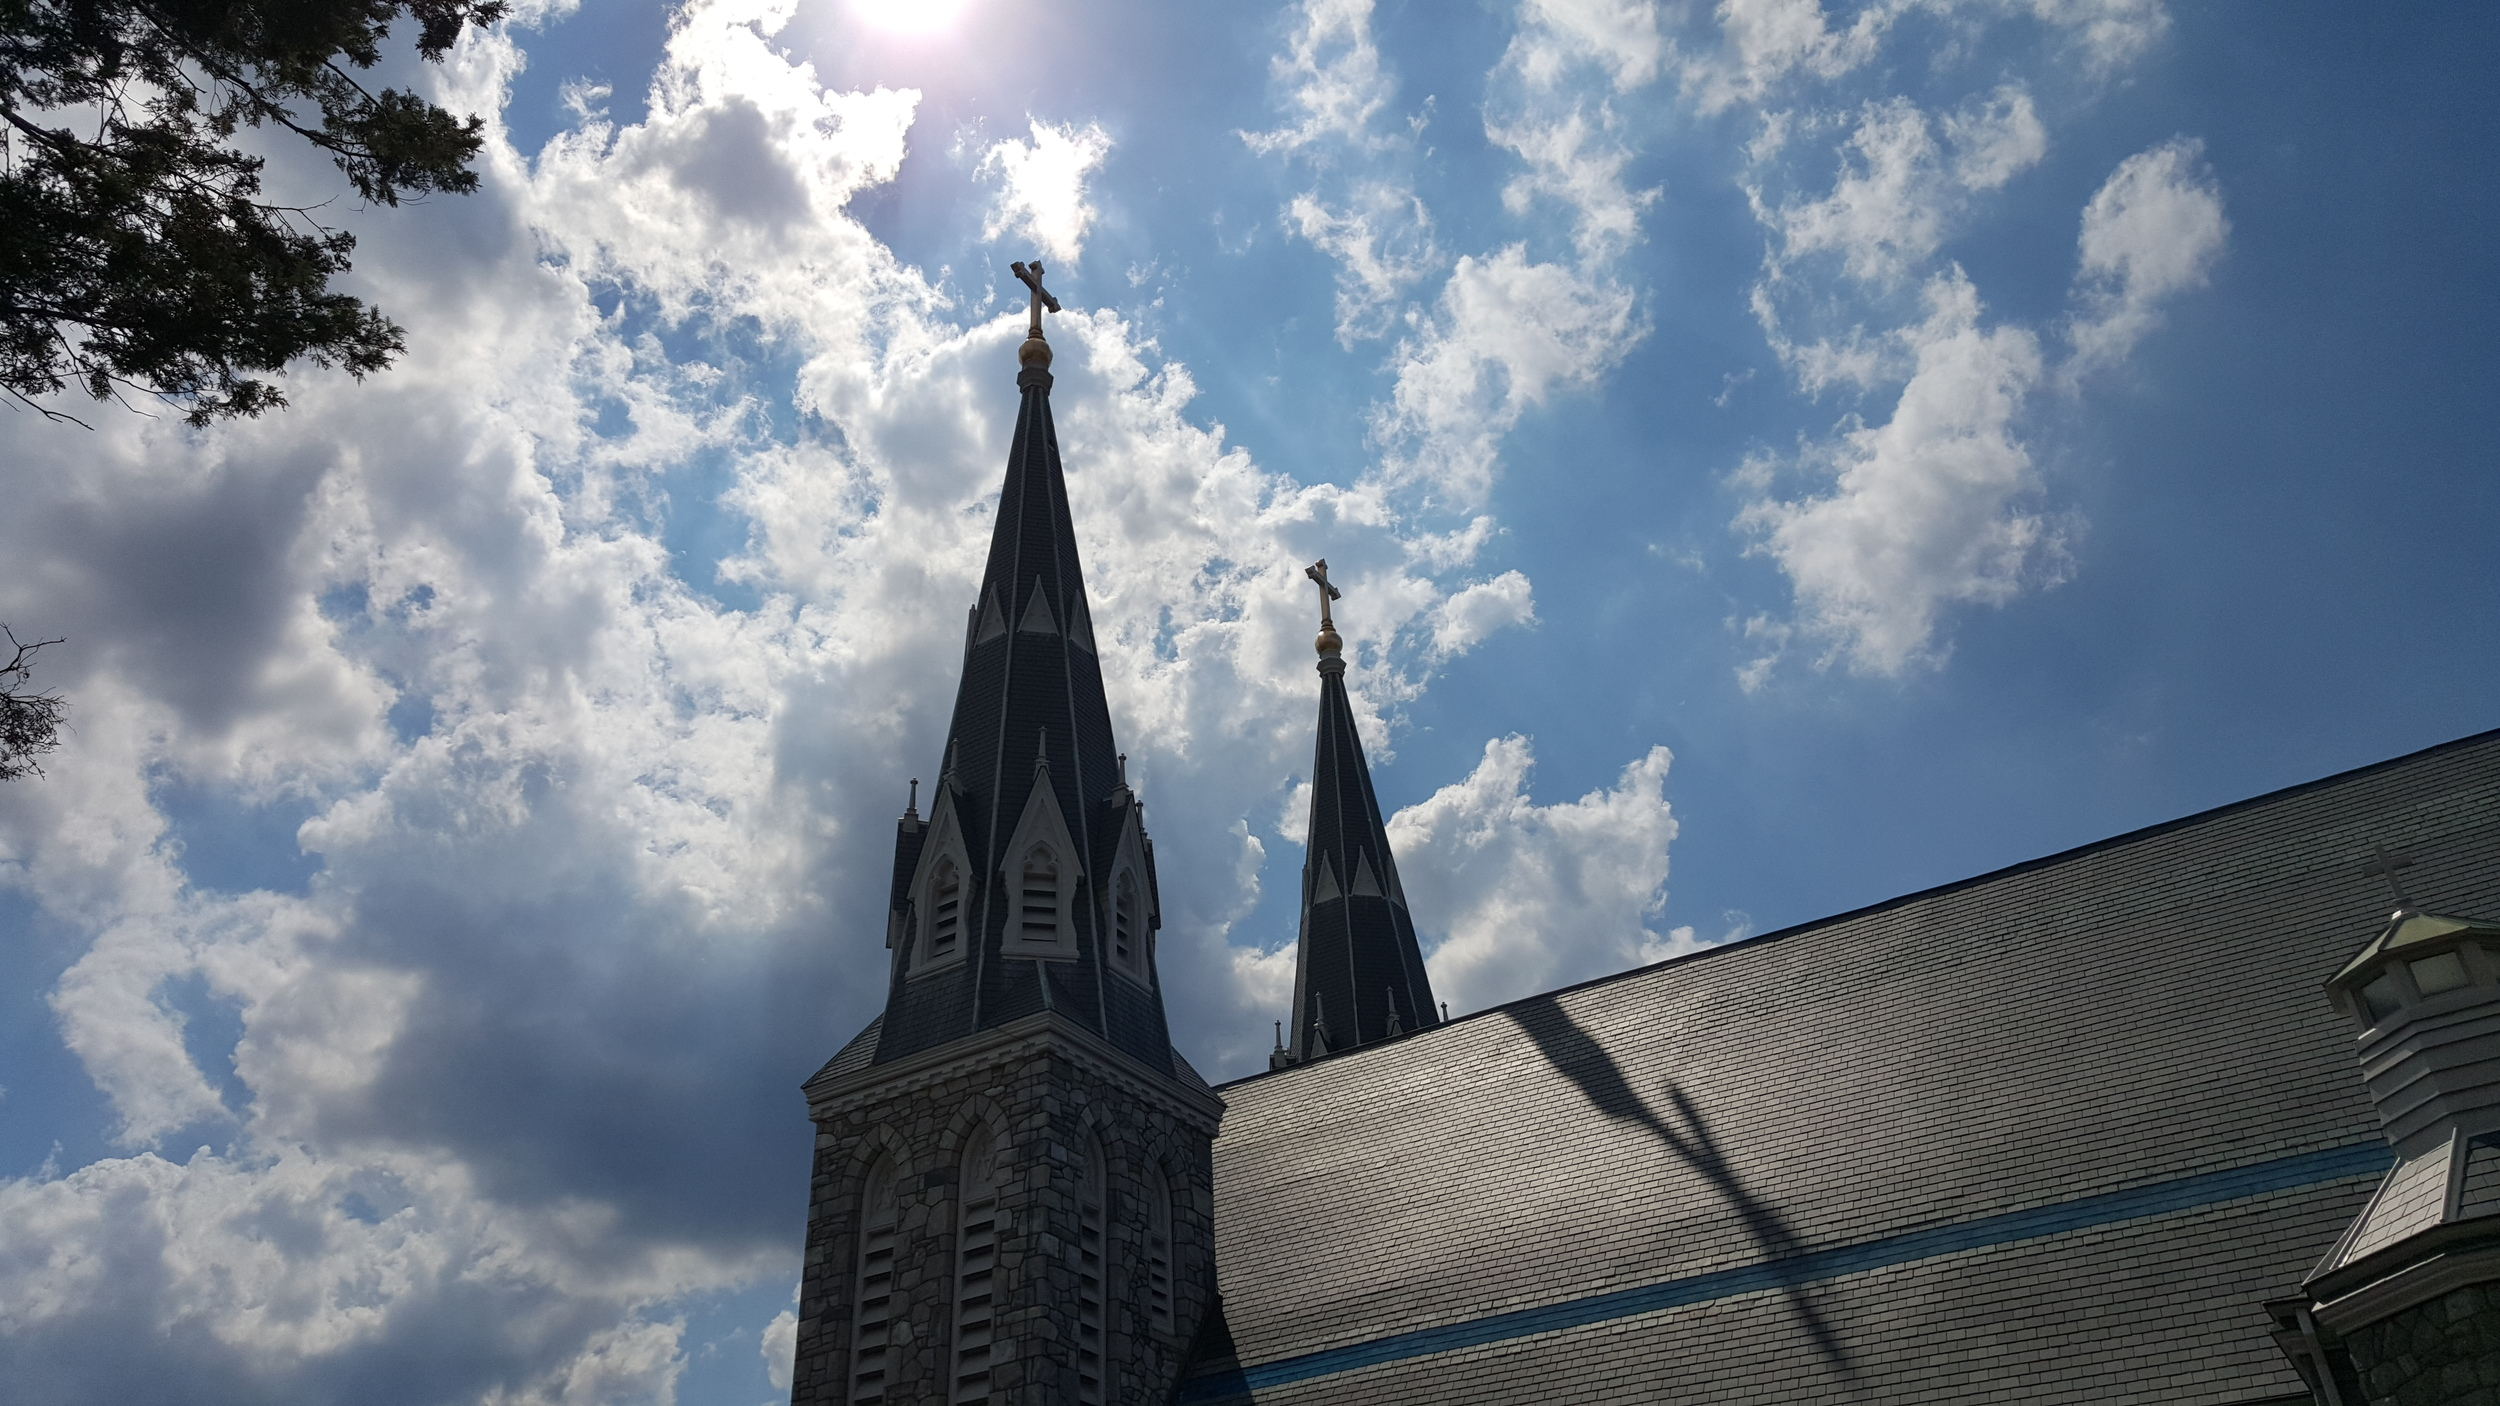 St Thomas of Villanova Church